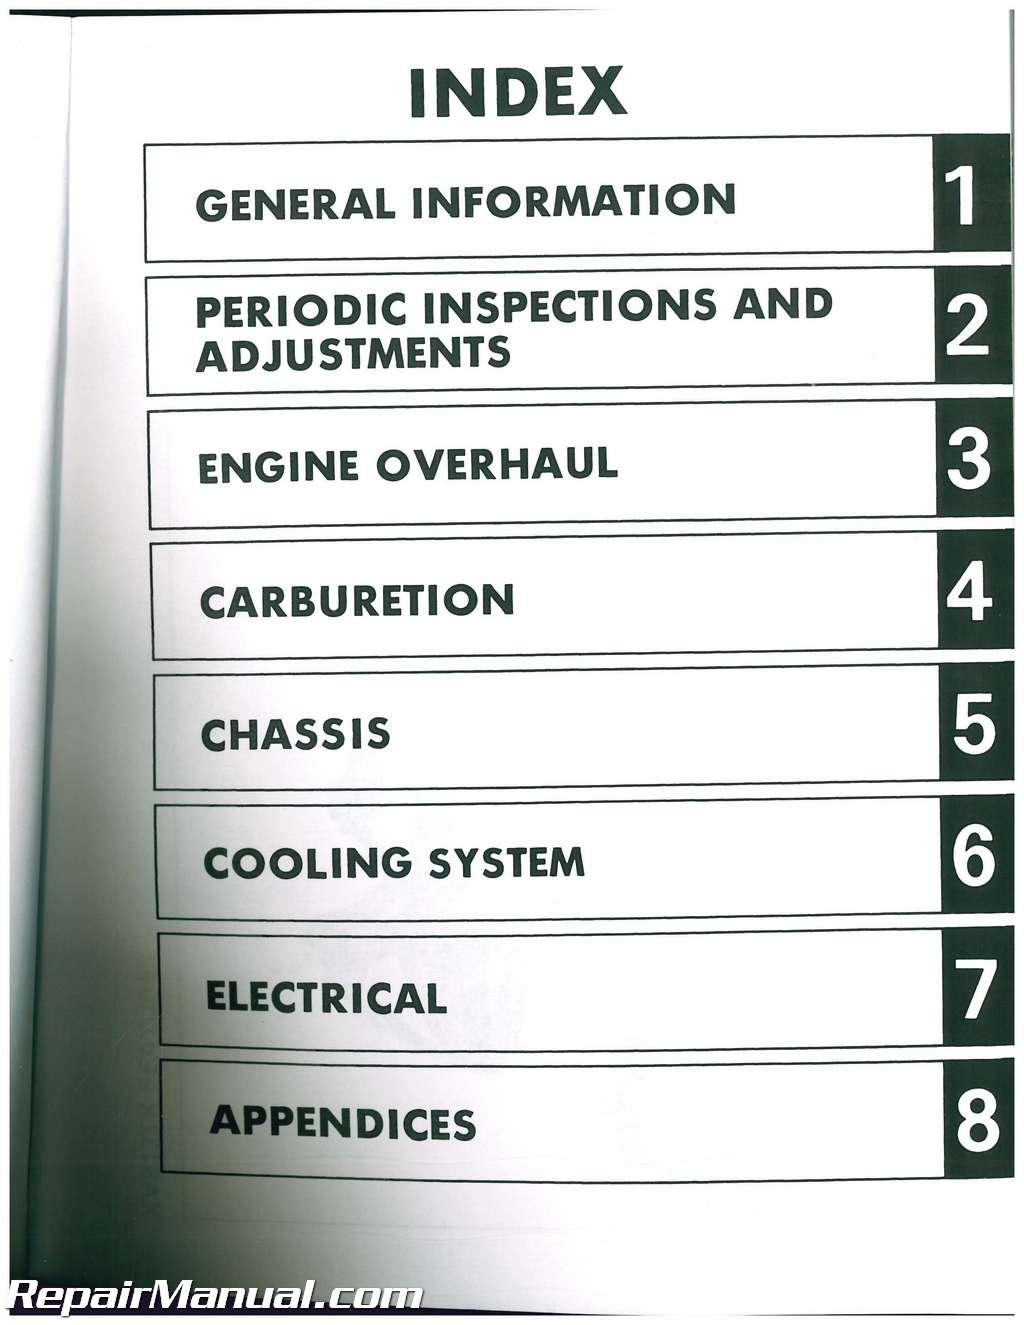 1983 1985 yamaha xvz1200 venture royale motorcycle service manual rh repairmanual com yamaha rs venture manual yamaha venture royale 1300 manual